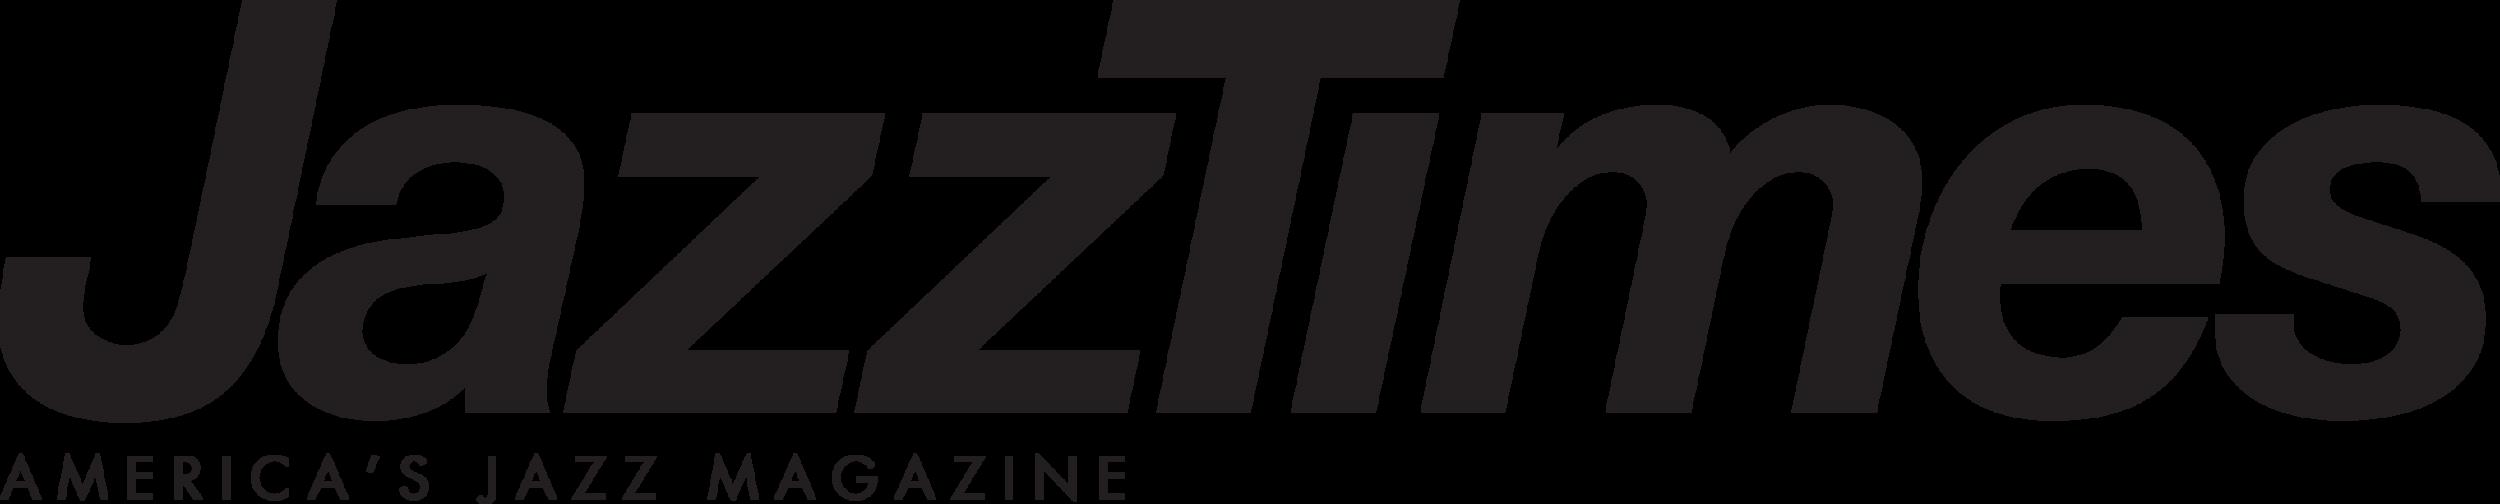 jazztimes.png